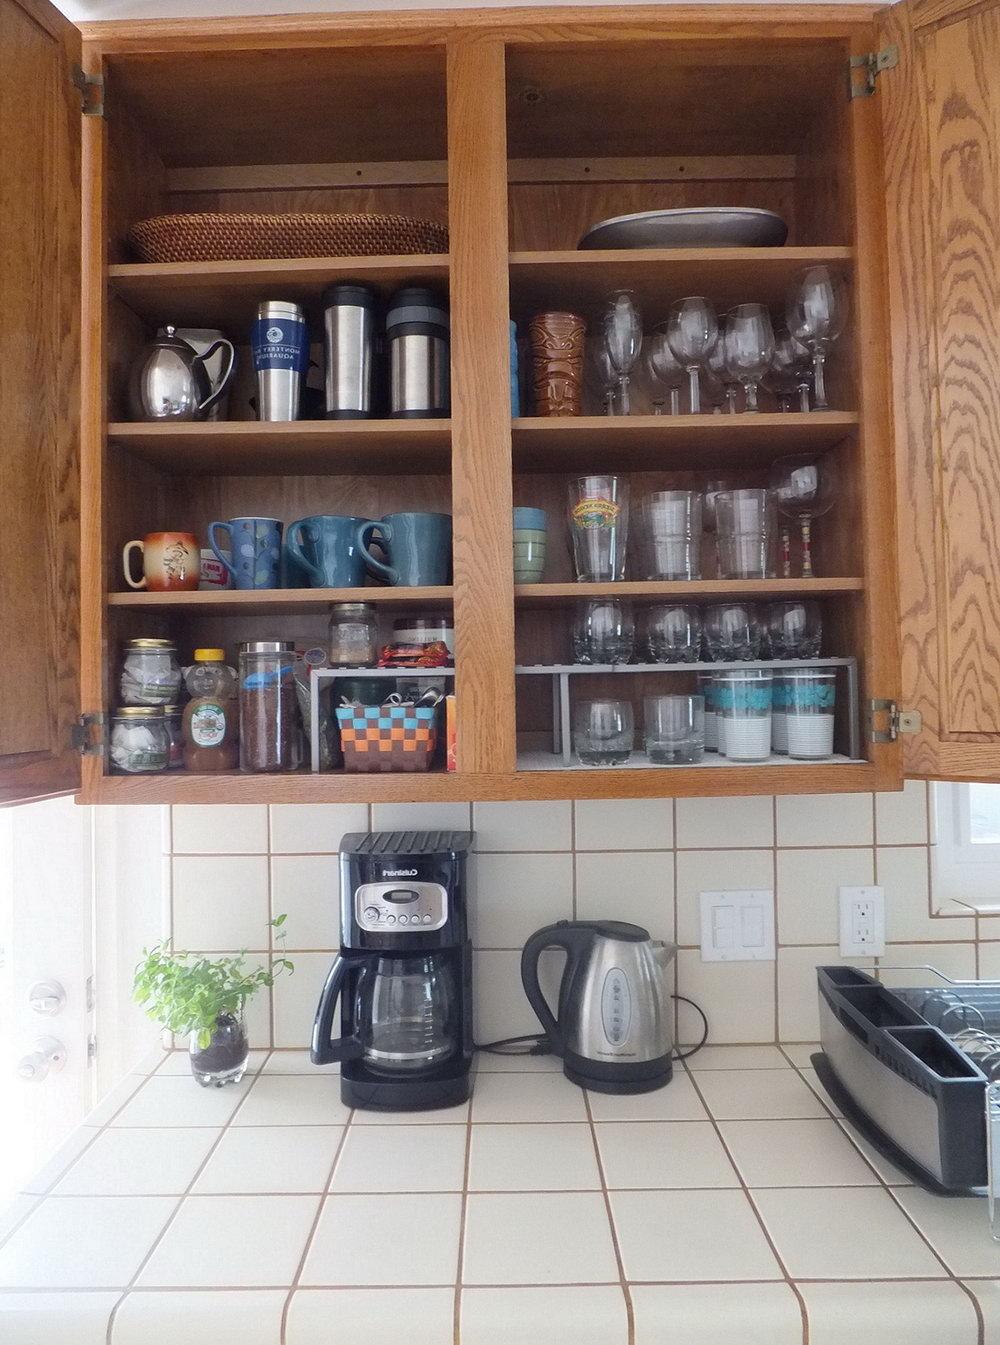 Kitchen Cabinets Organization Products